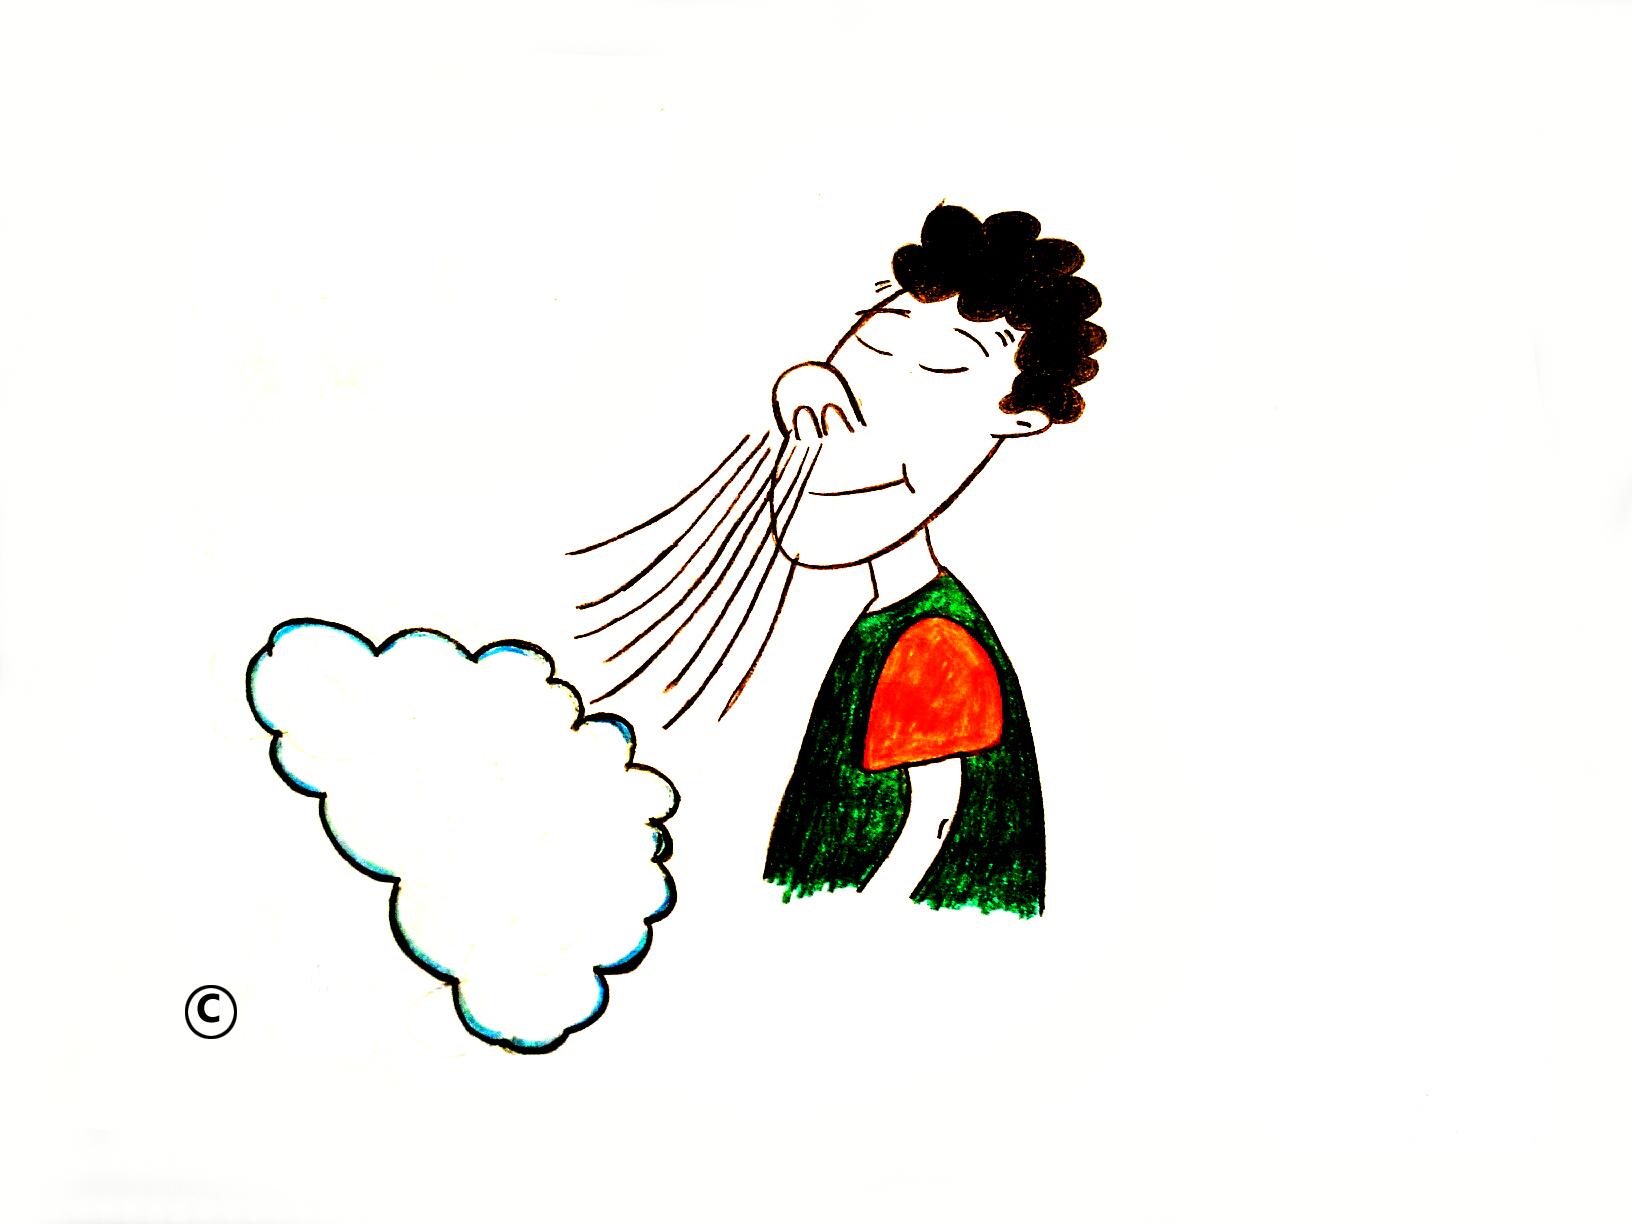 Cartoon Person Breathing Oxygen